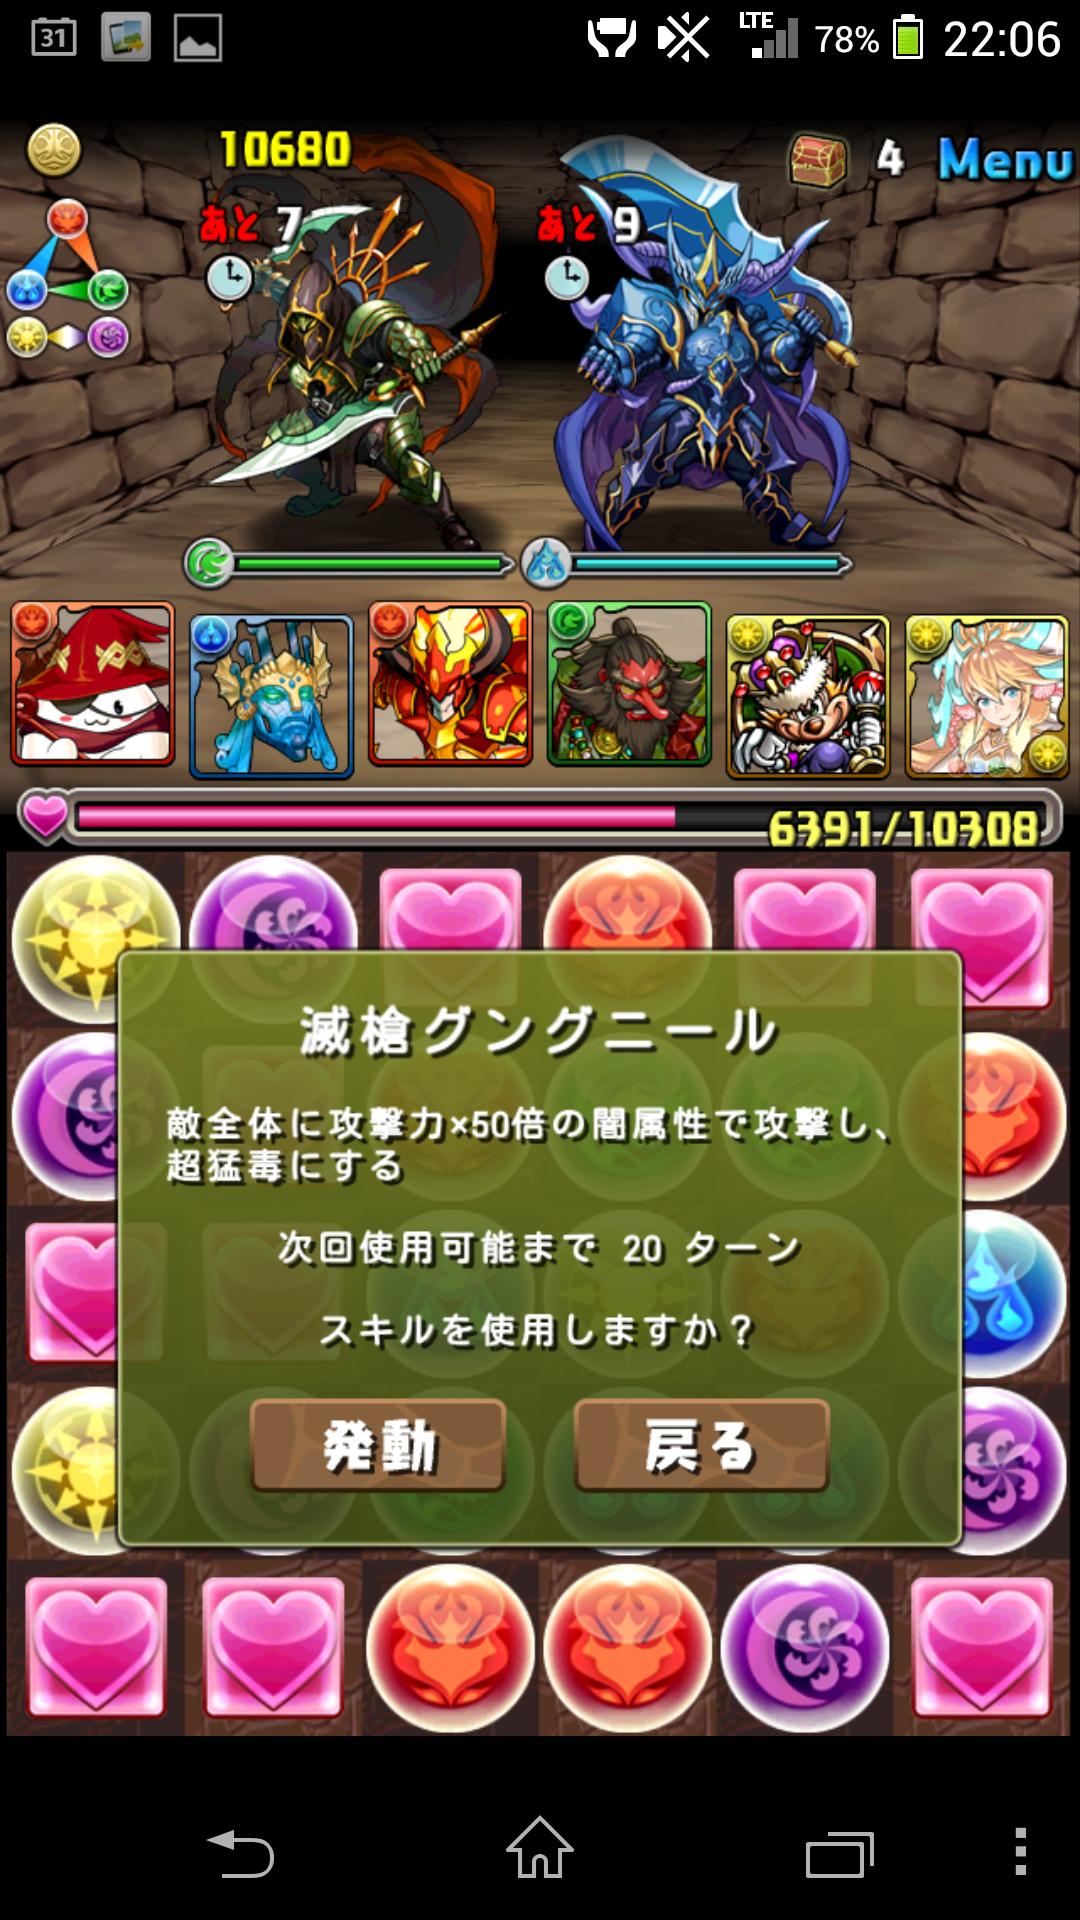 Screenshot_2014-05-12-22-06-50.png